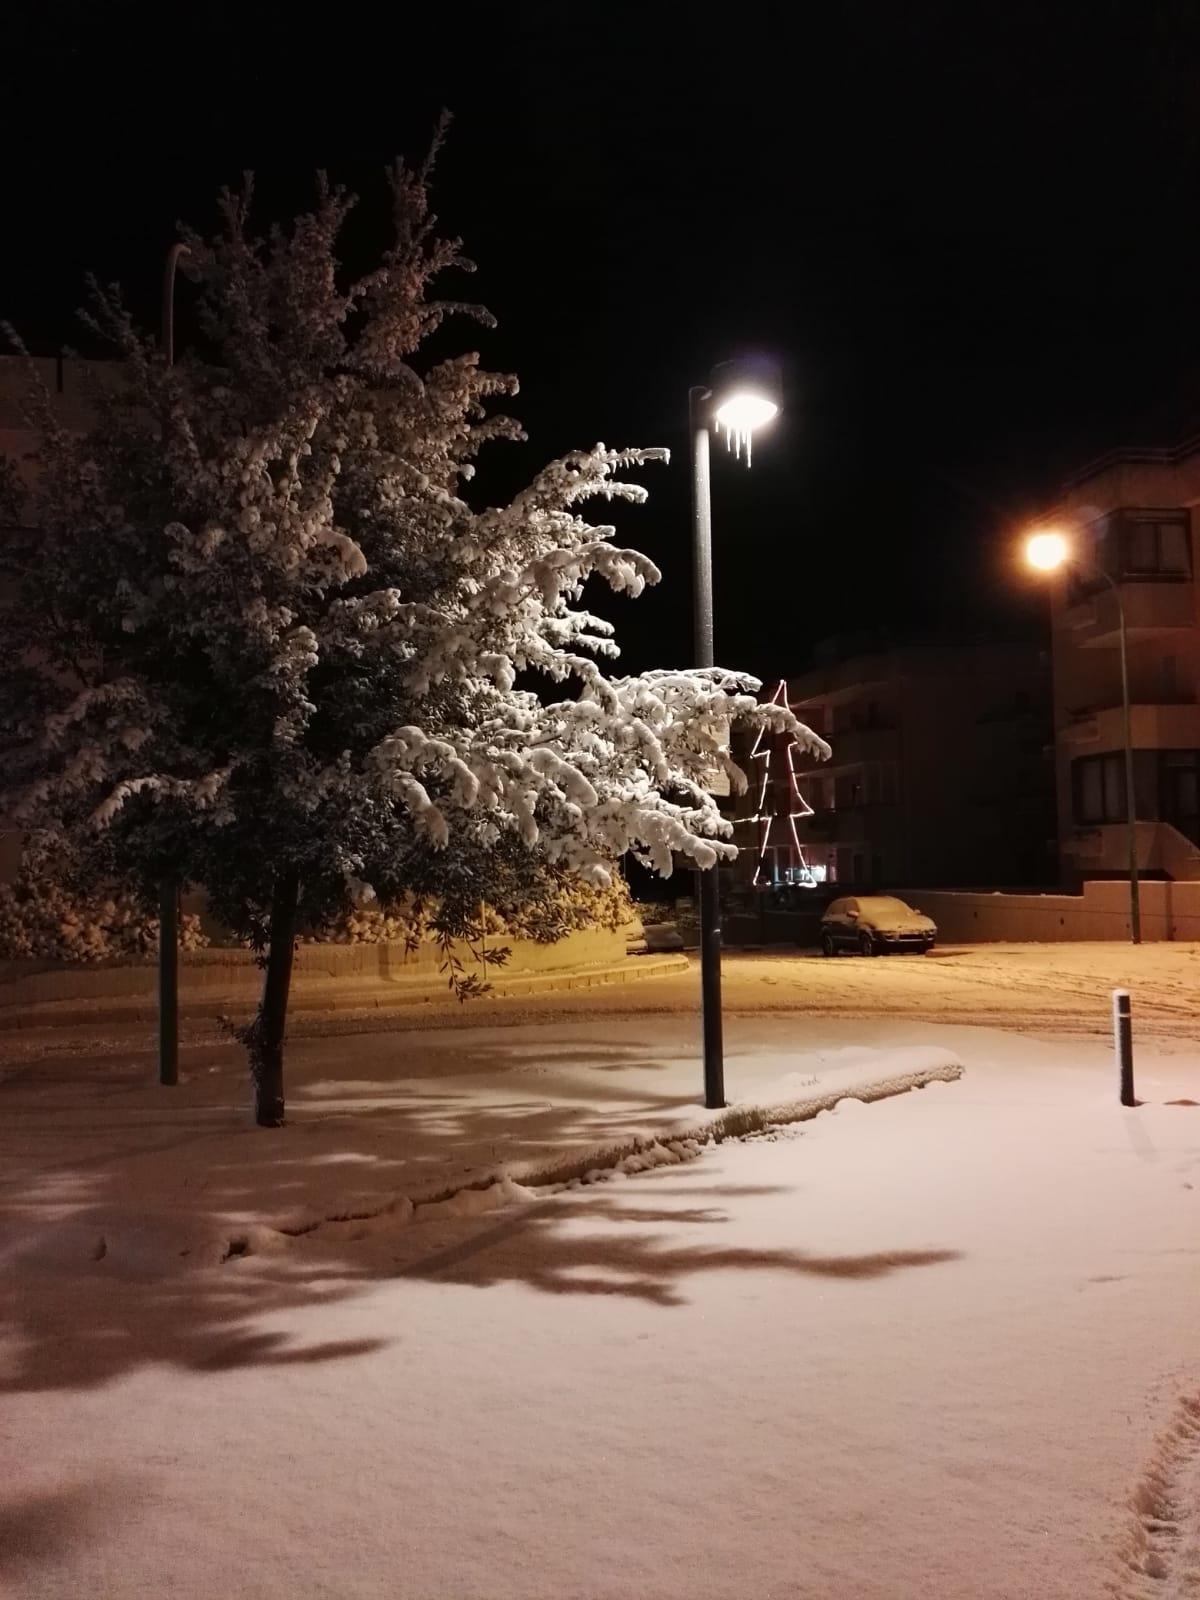 Galleria fotografica neve 03-04 gennaio 2019-neve2019-n4.jpg